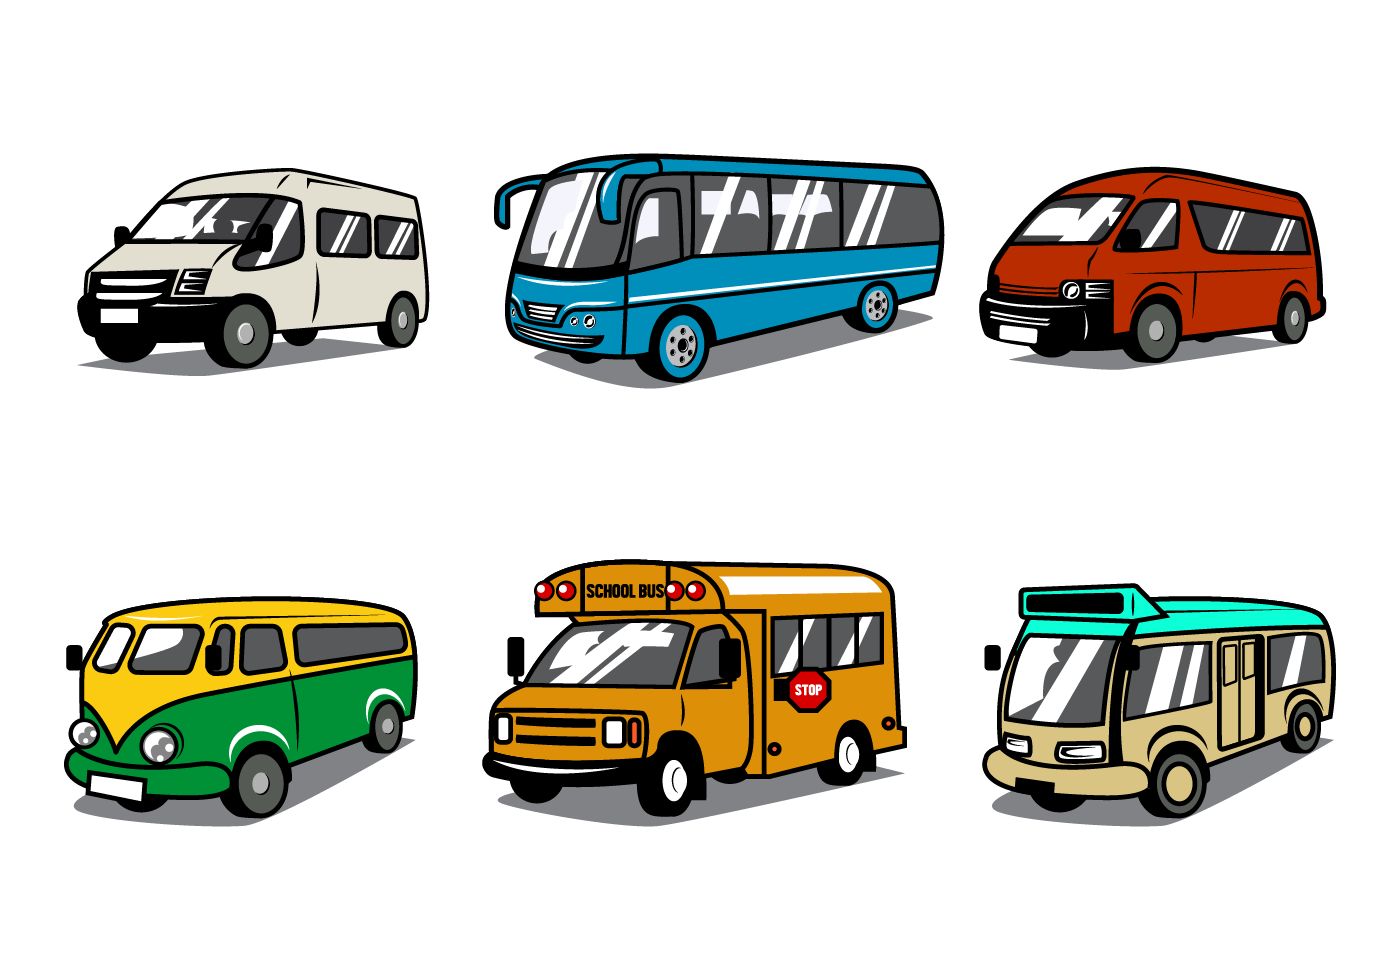 Free Minibus Vector - Download Free Vector Art, Stock Graphics & Images